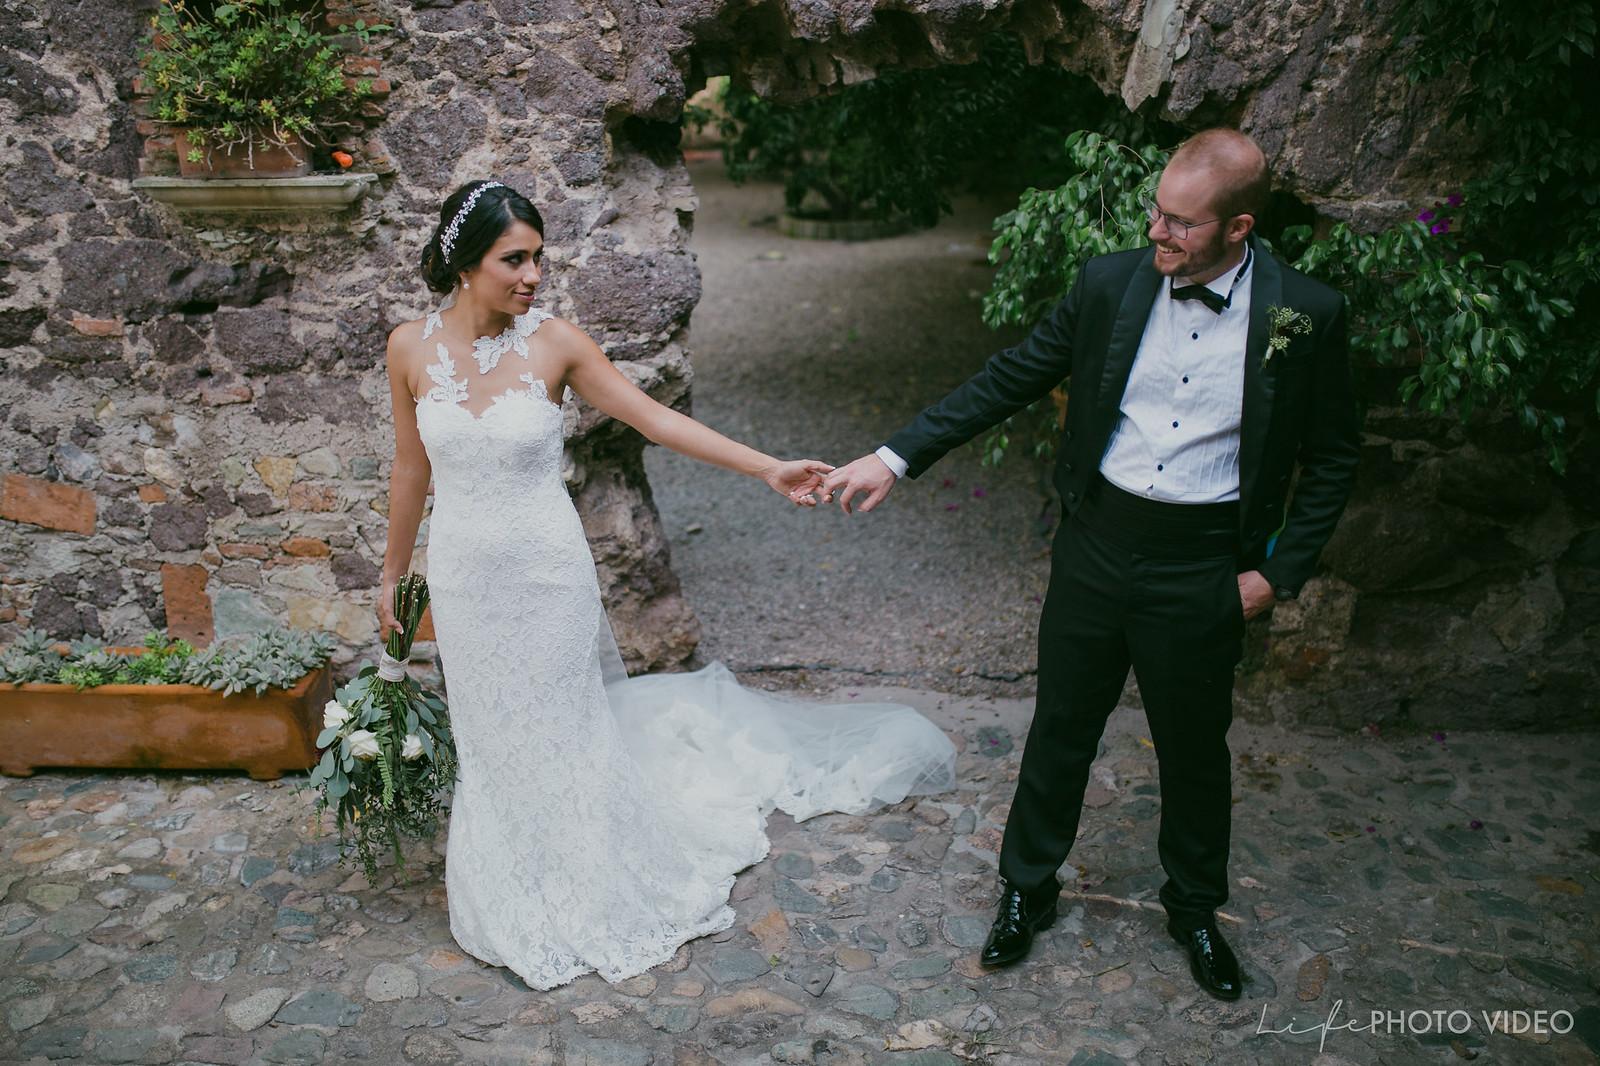 LifePhotoVideo_Boda_Guanajuato_Wedding_0024